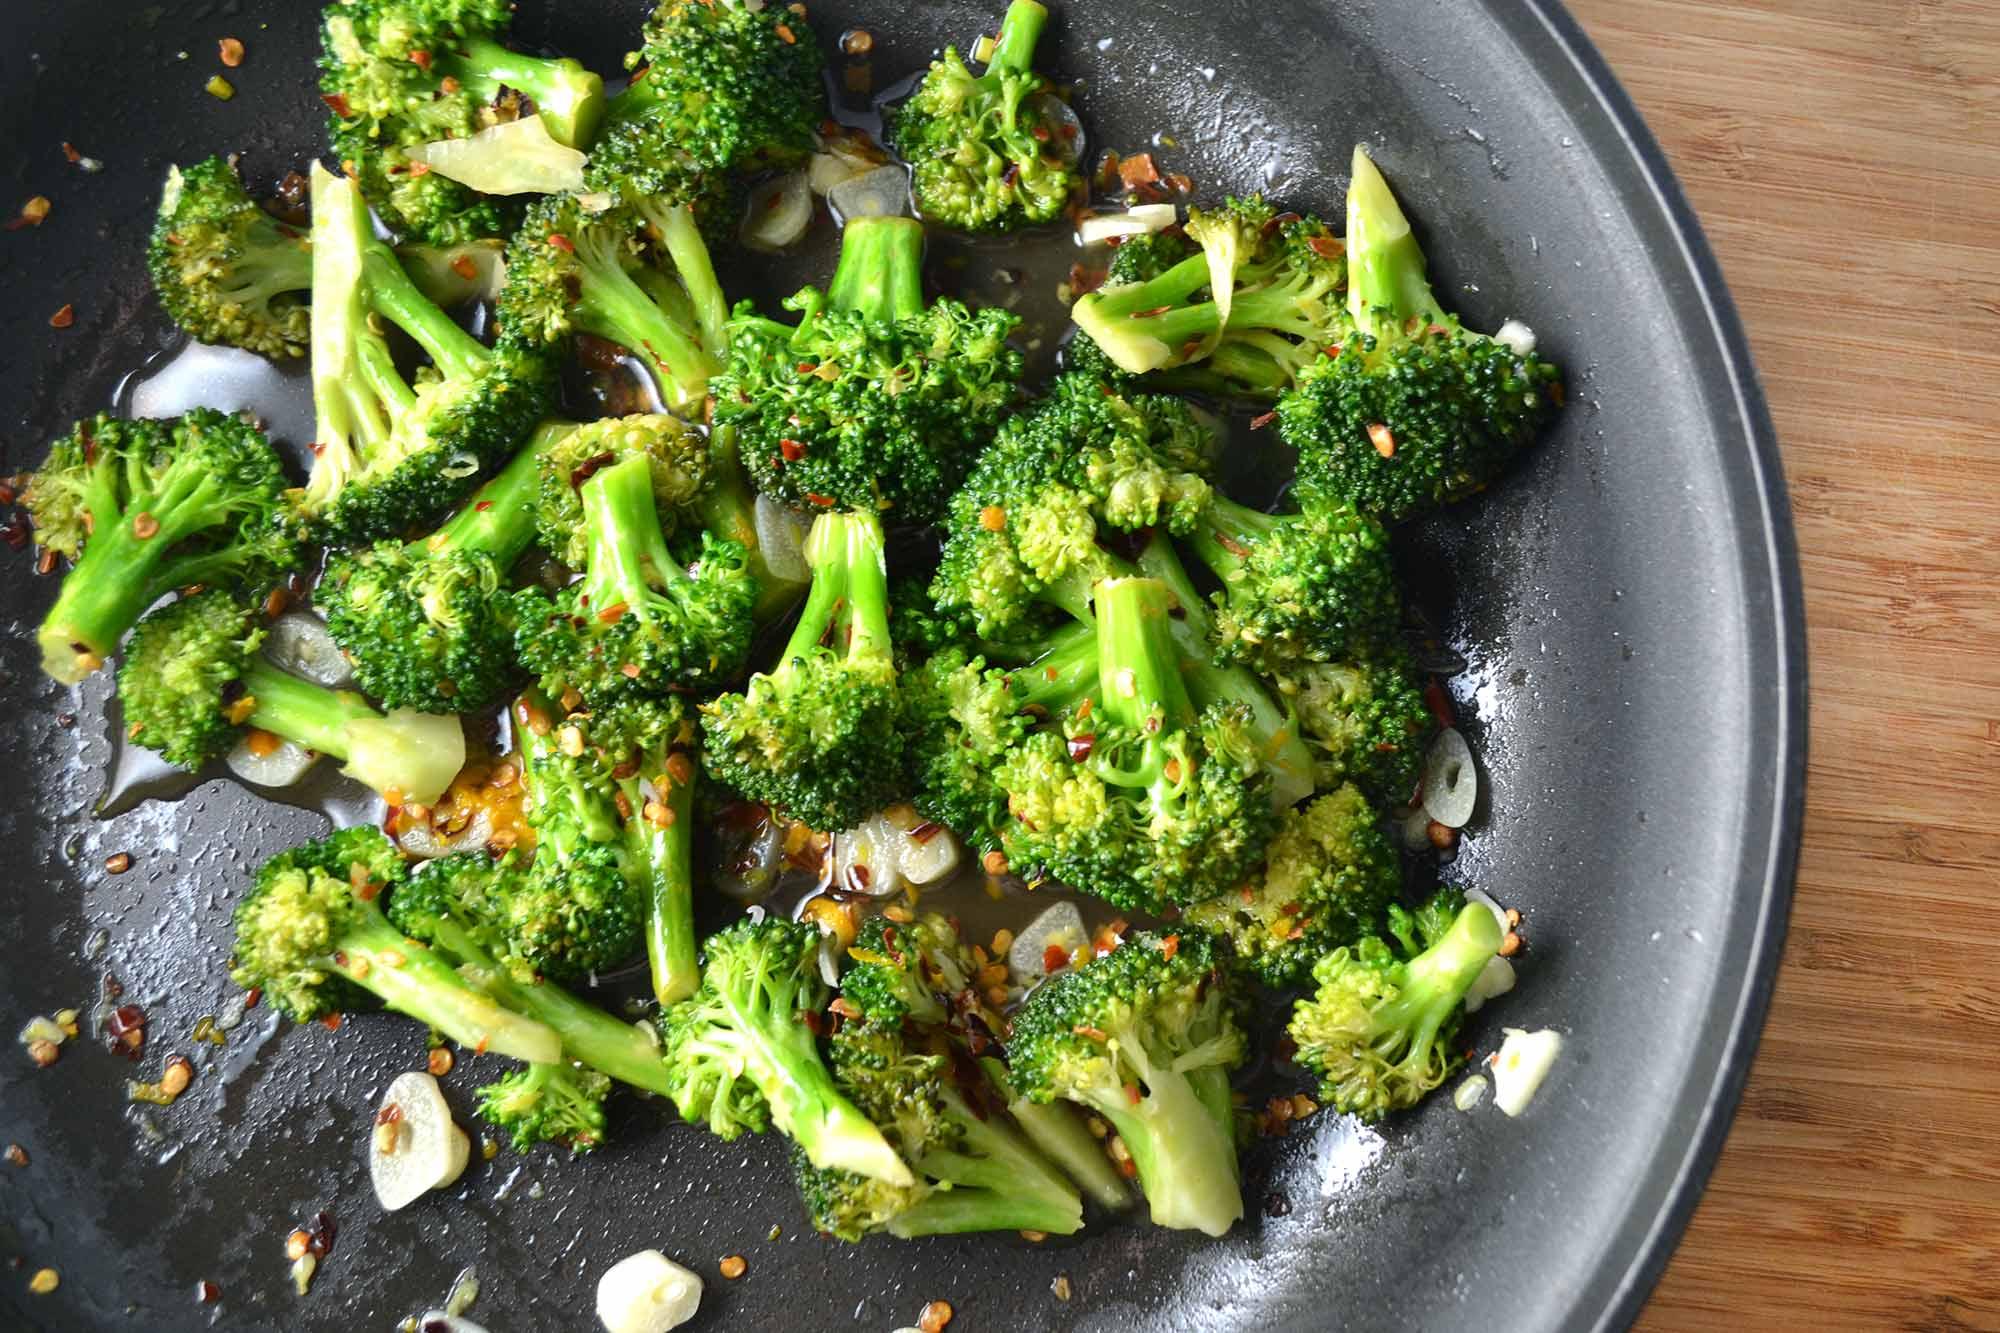 Fresh Broccoli Recipes Sauteed